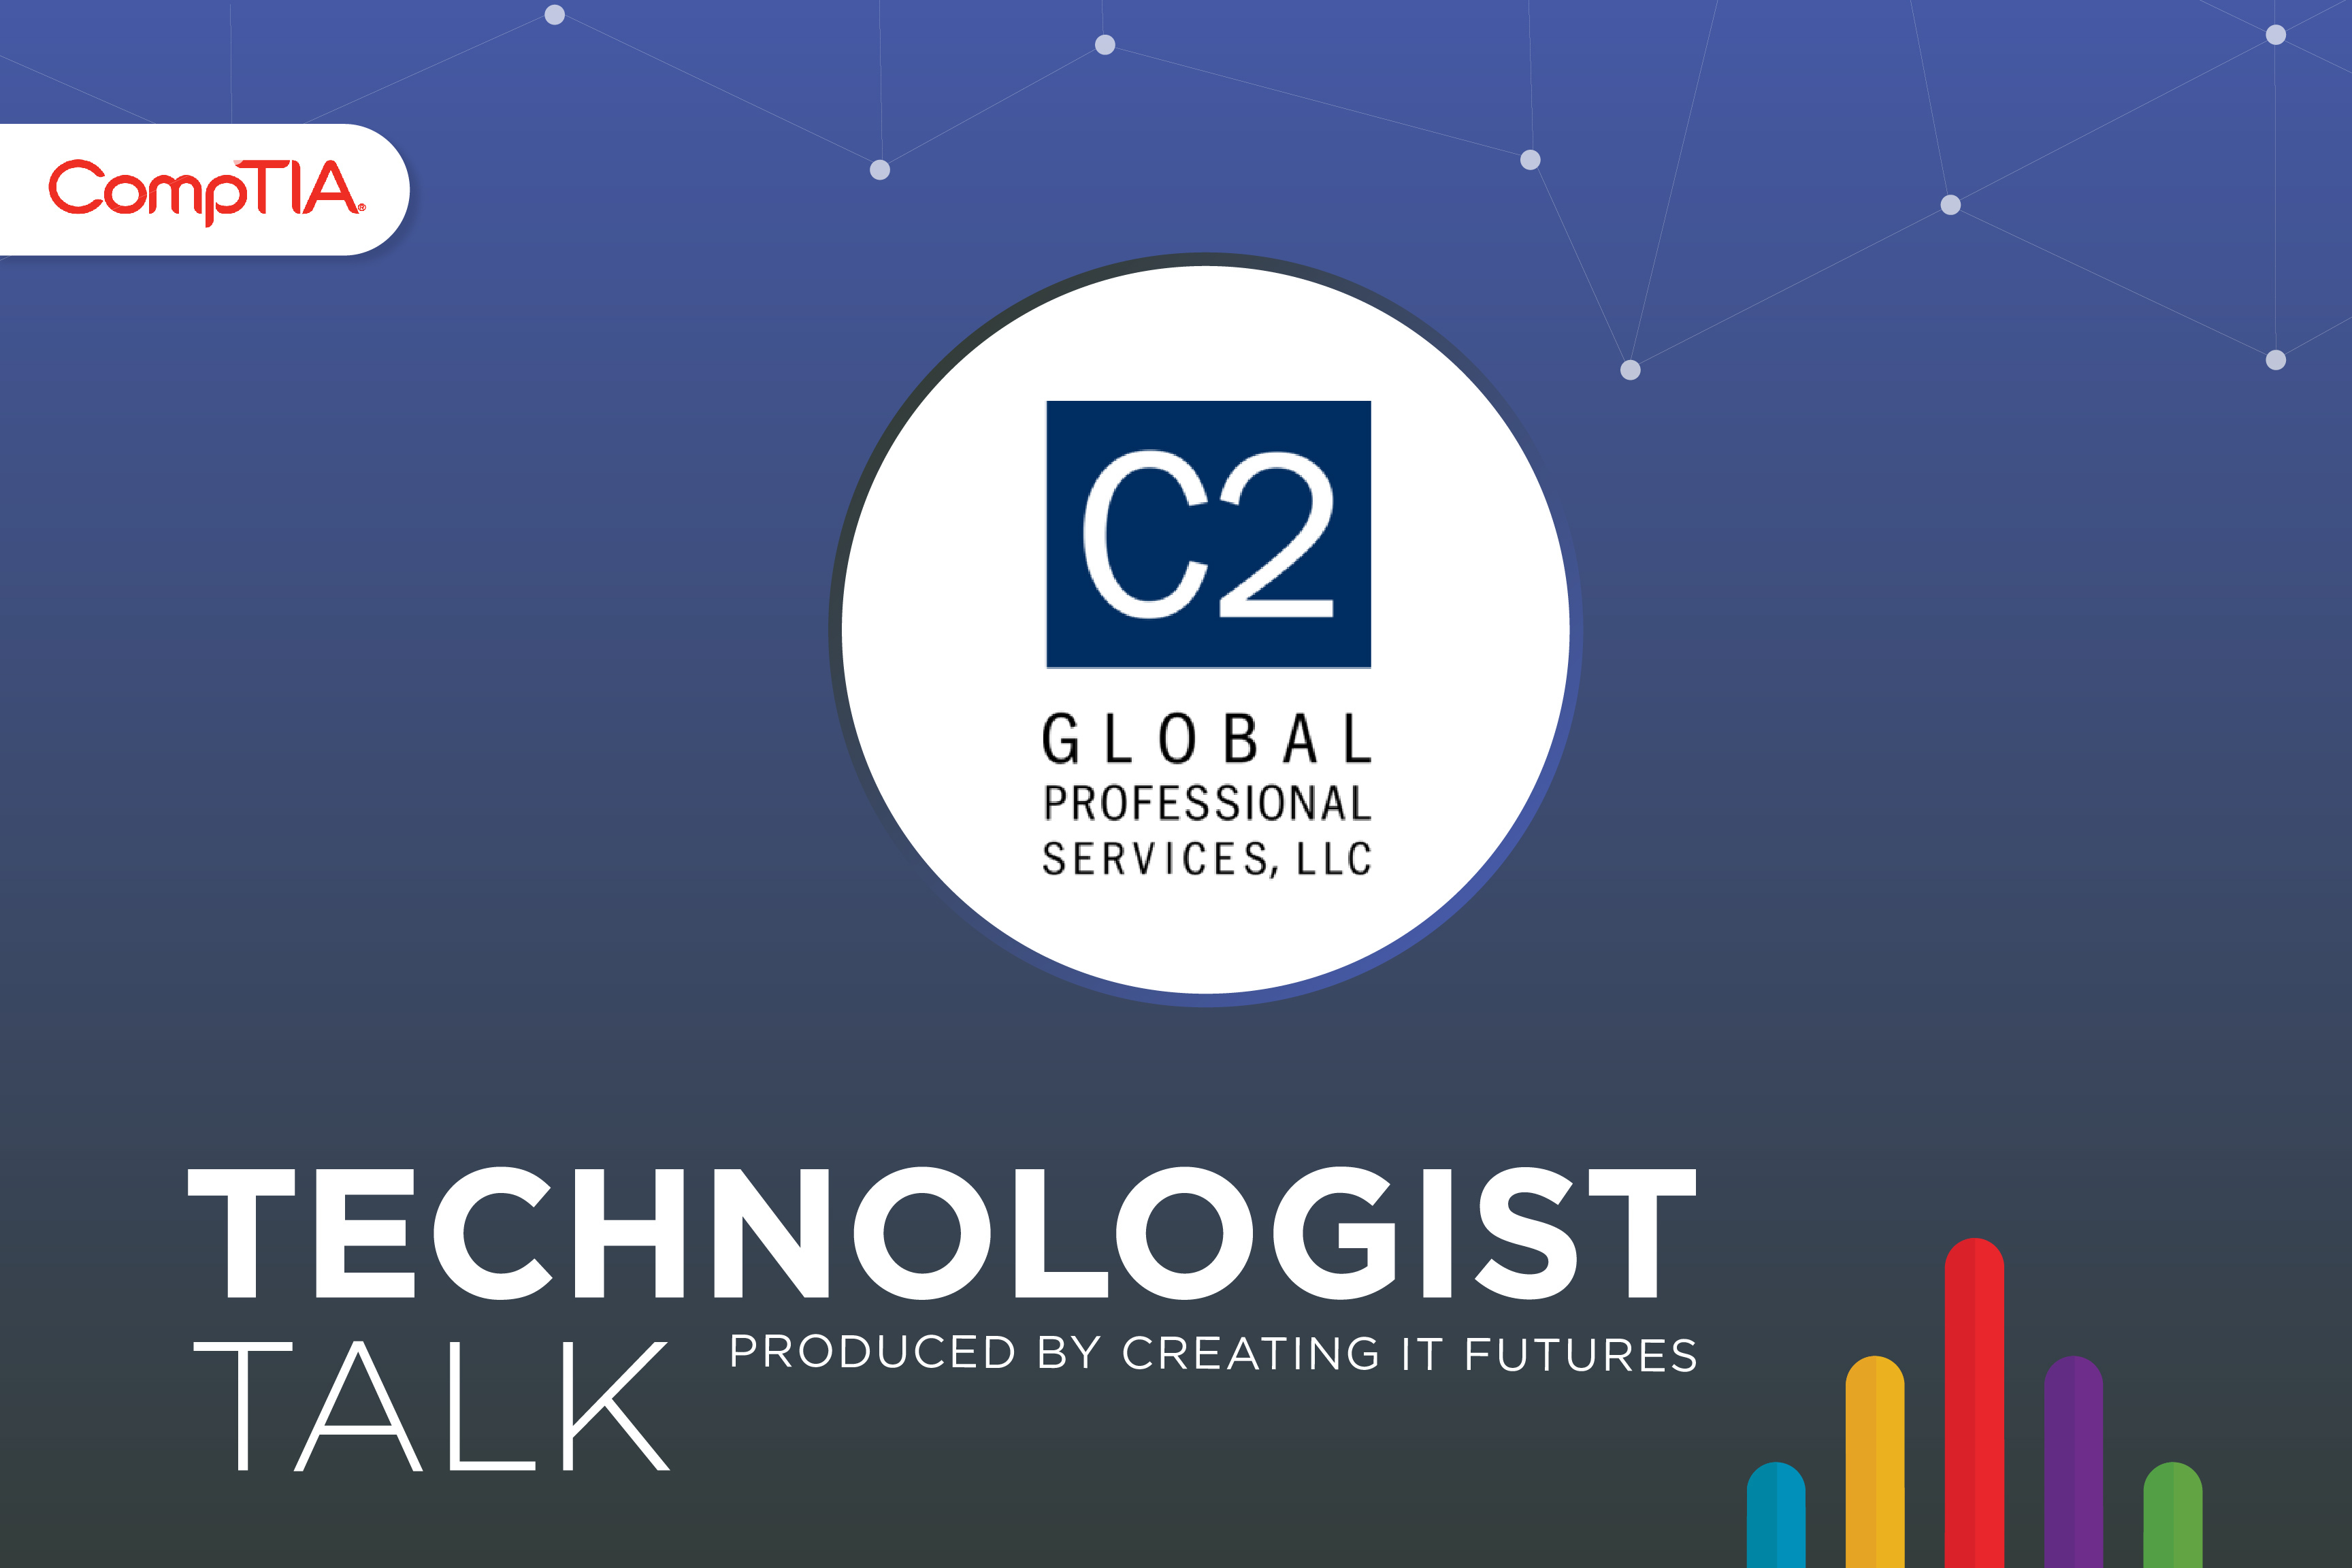 C2 Global Talks about custom training